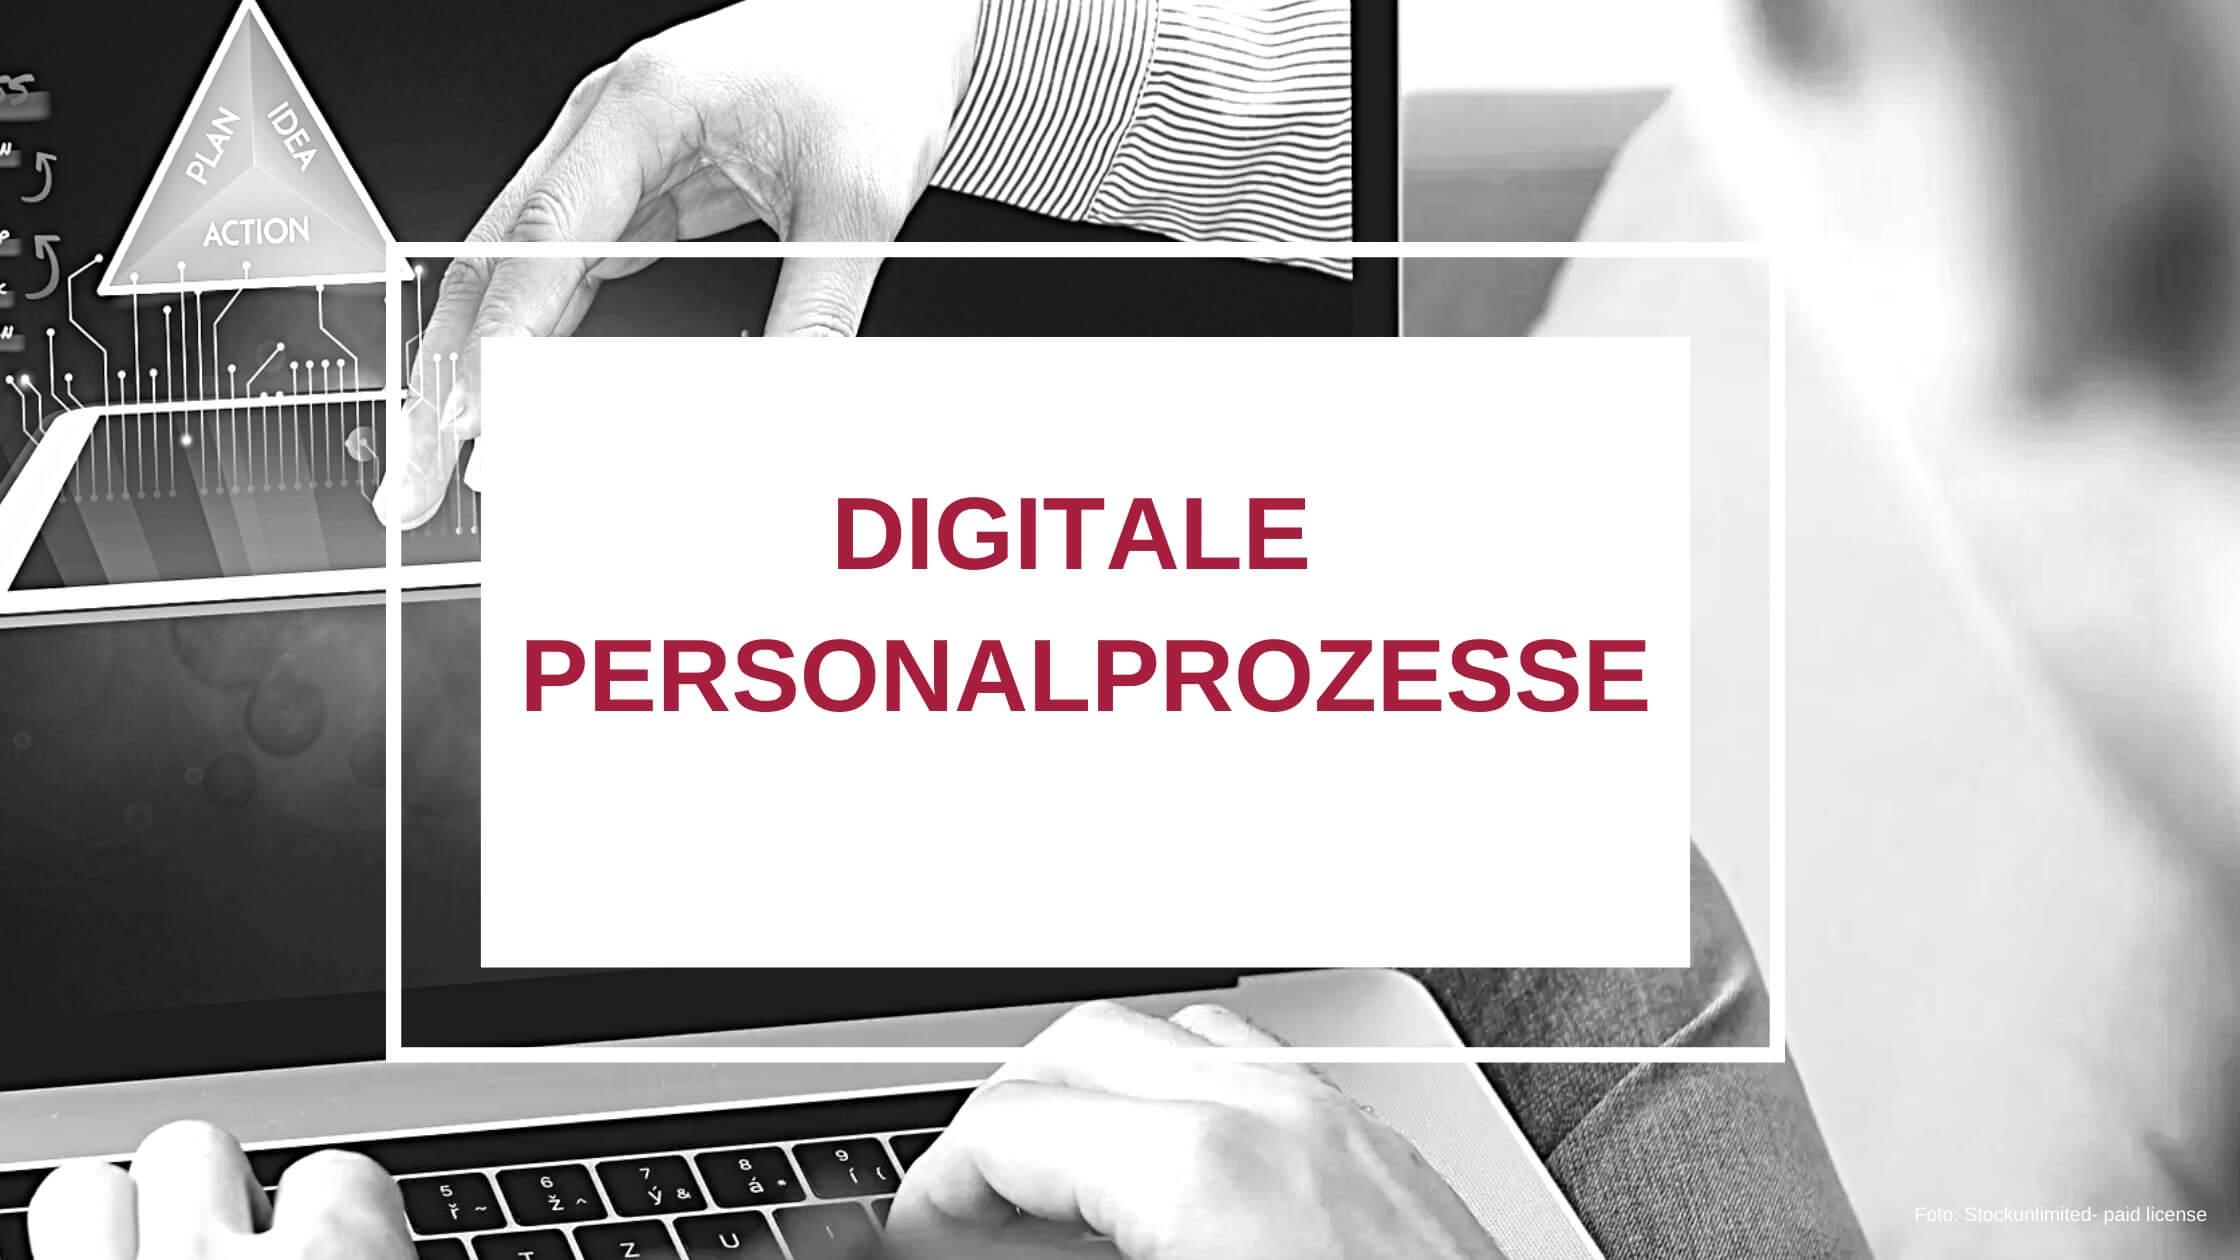 Digitale Personalprozesse HR konkret